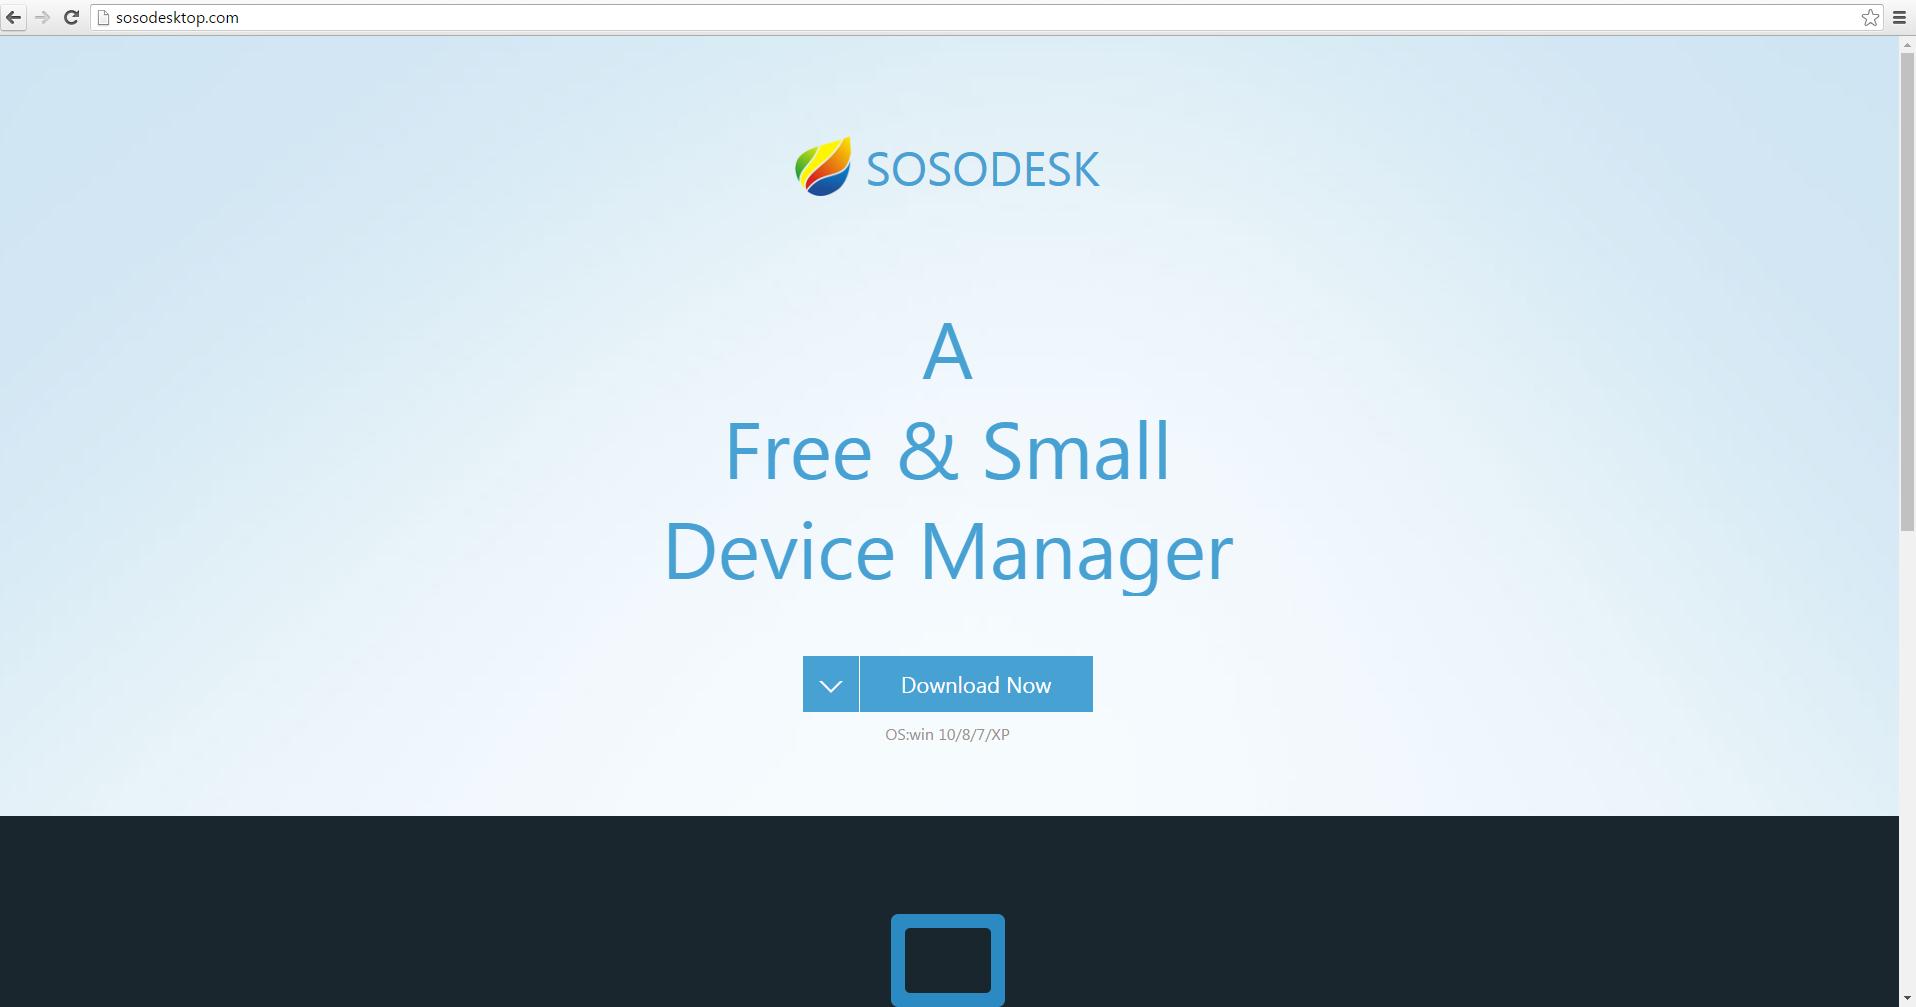 sosodesktop-mainpage-bestsecuritysearch